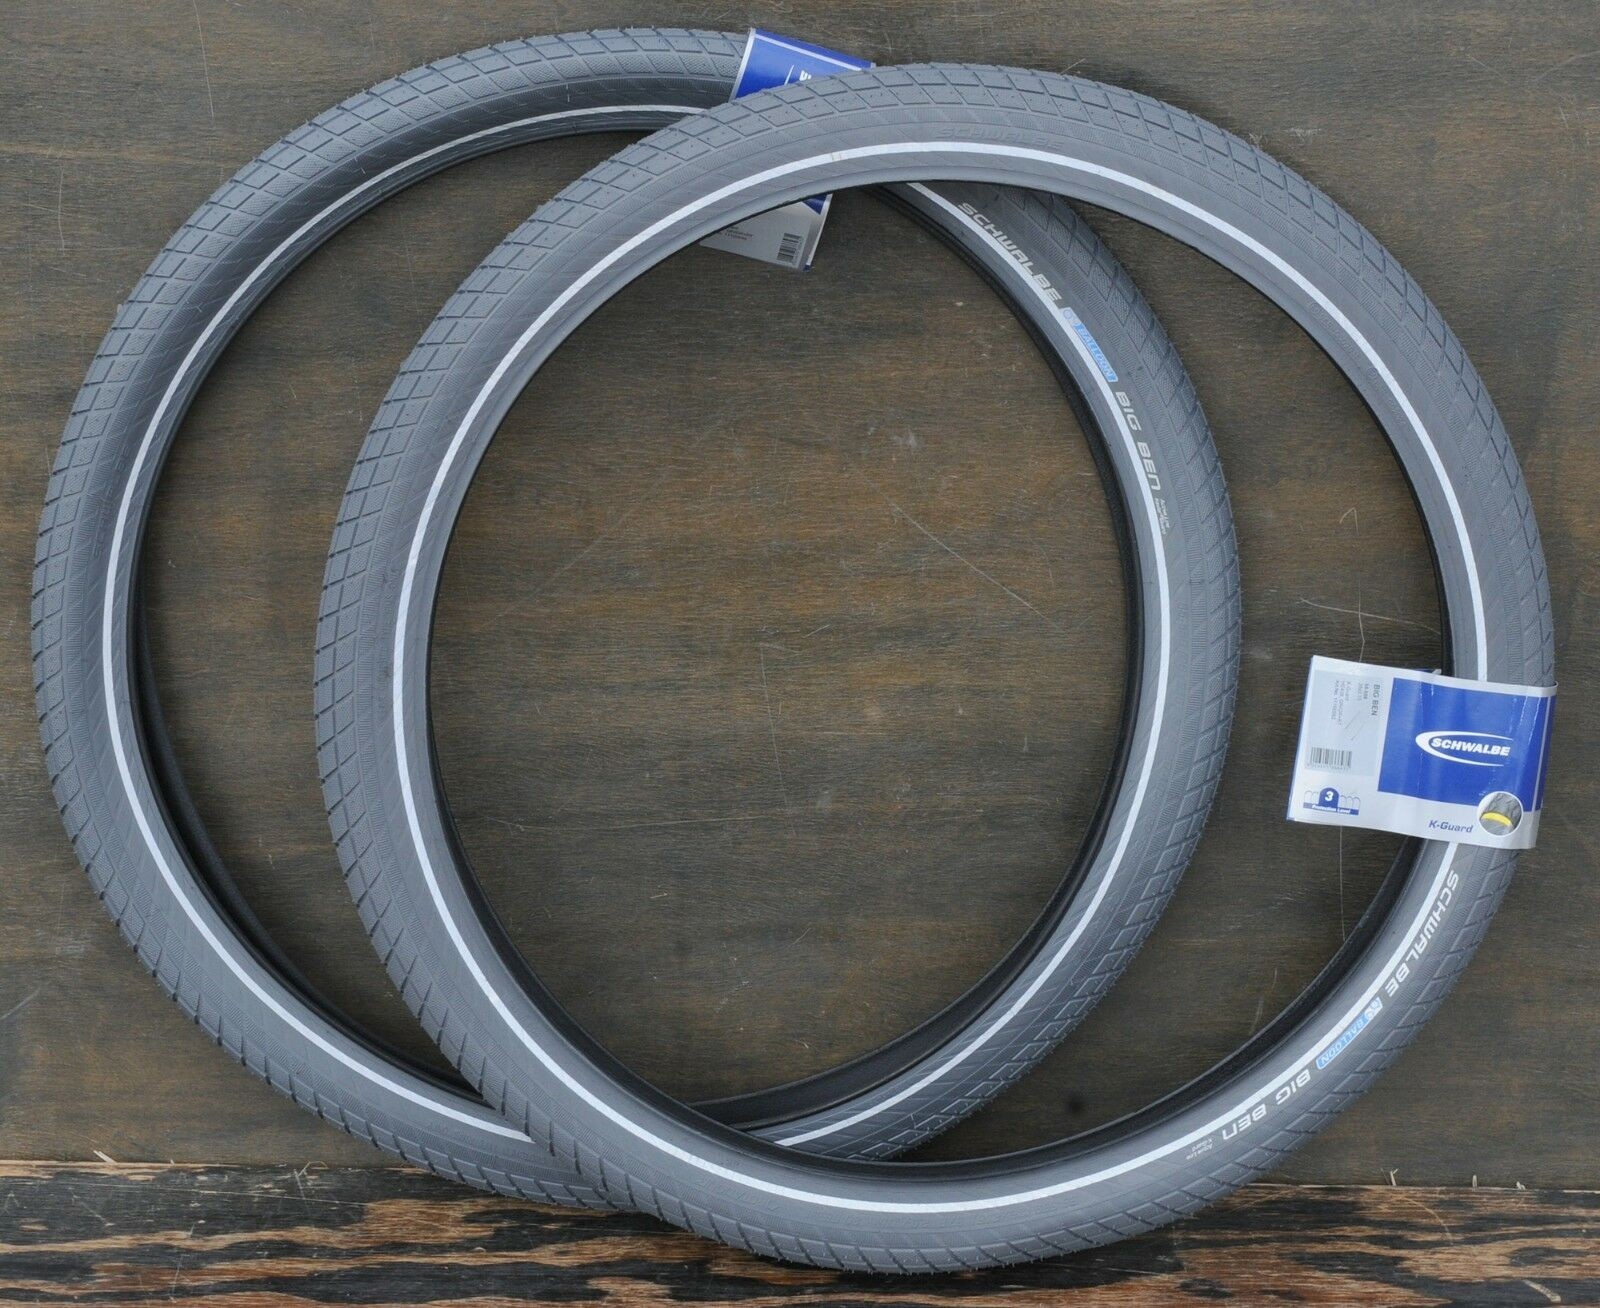 26 X2 15 Fat Grey Schwalbe Bb Cruiser Bicycle Tires Vintage